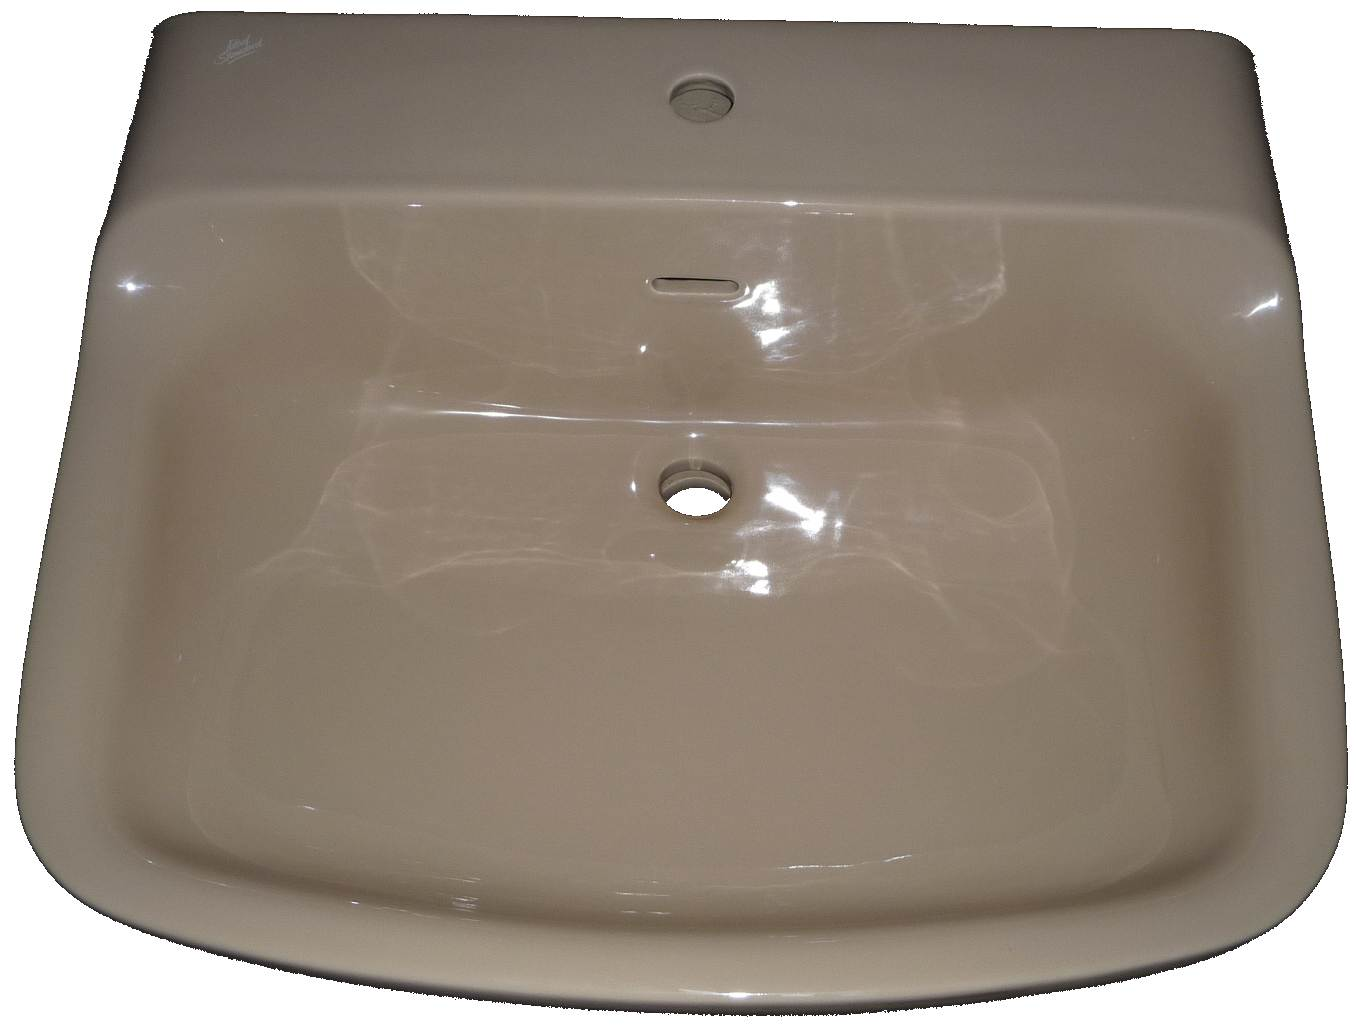 bahamabeige Waschtisch 70 cm Ideal Standard Tonca Bild 1